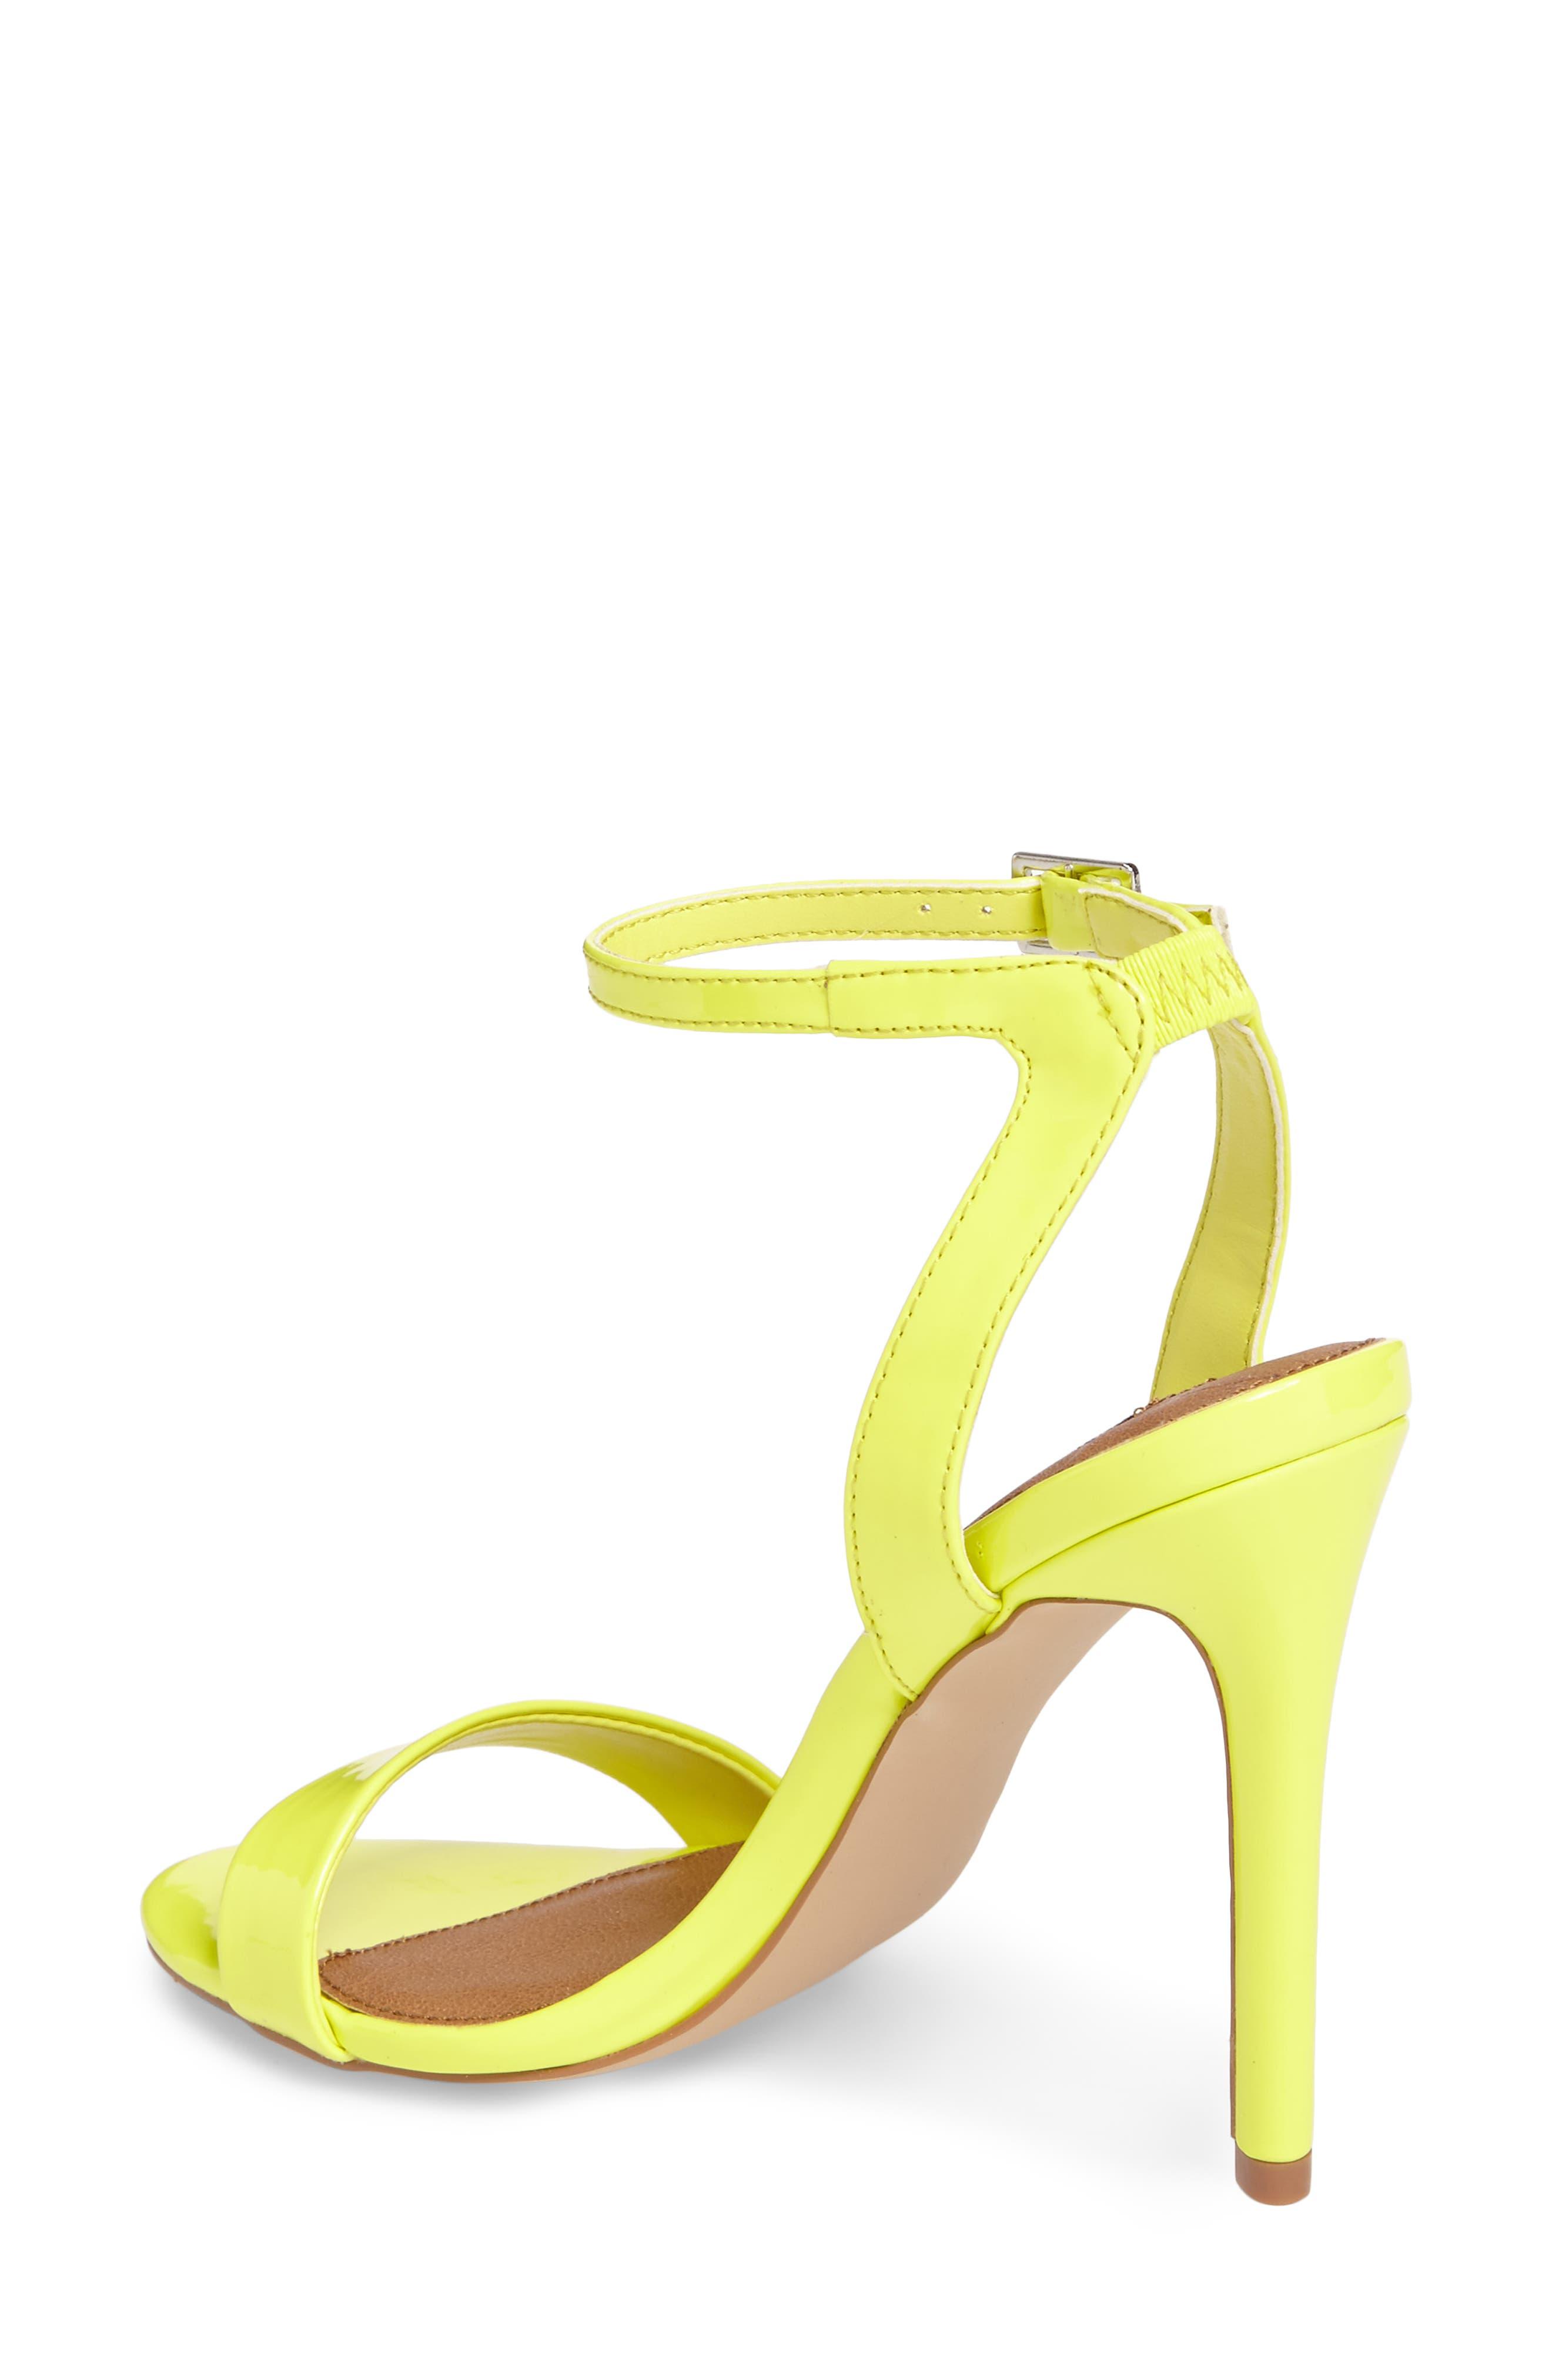 ,                             Landen Ankle Strap Sandal,                             Alternate thumbnail 44, color,                             704